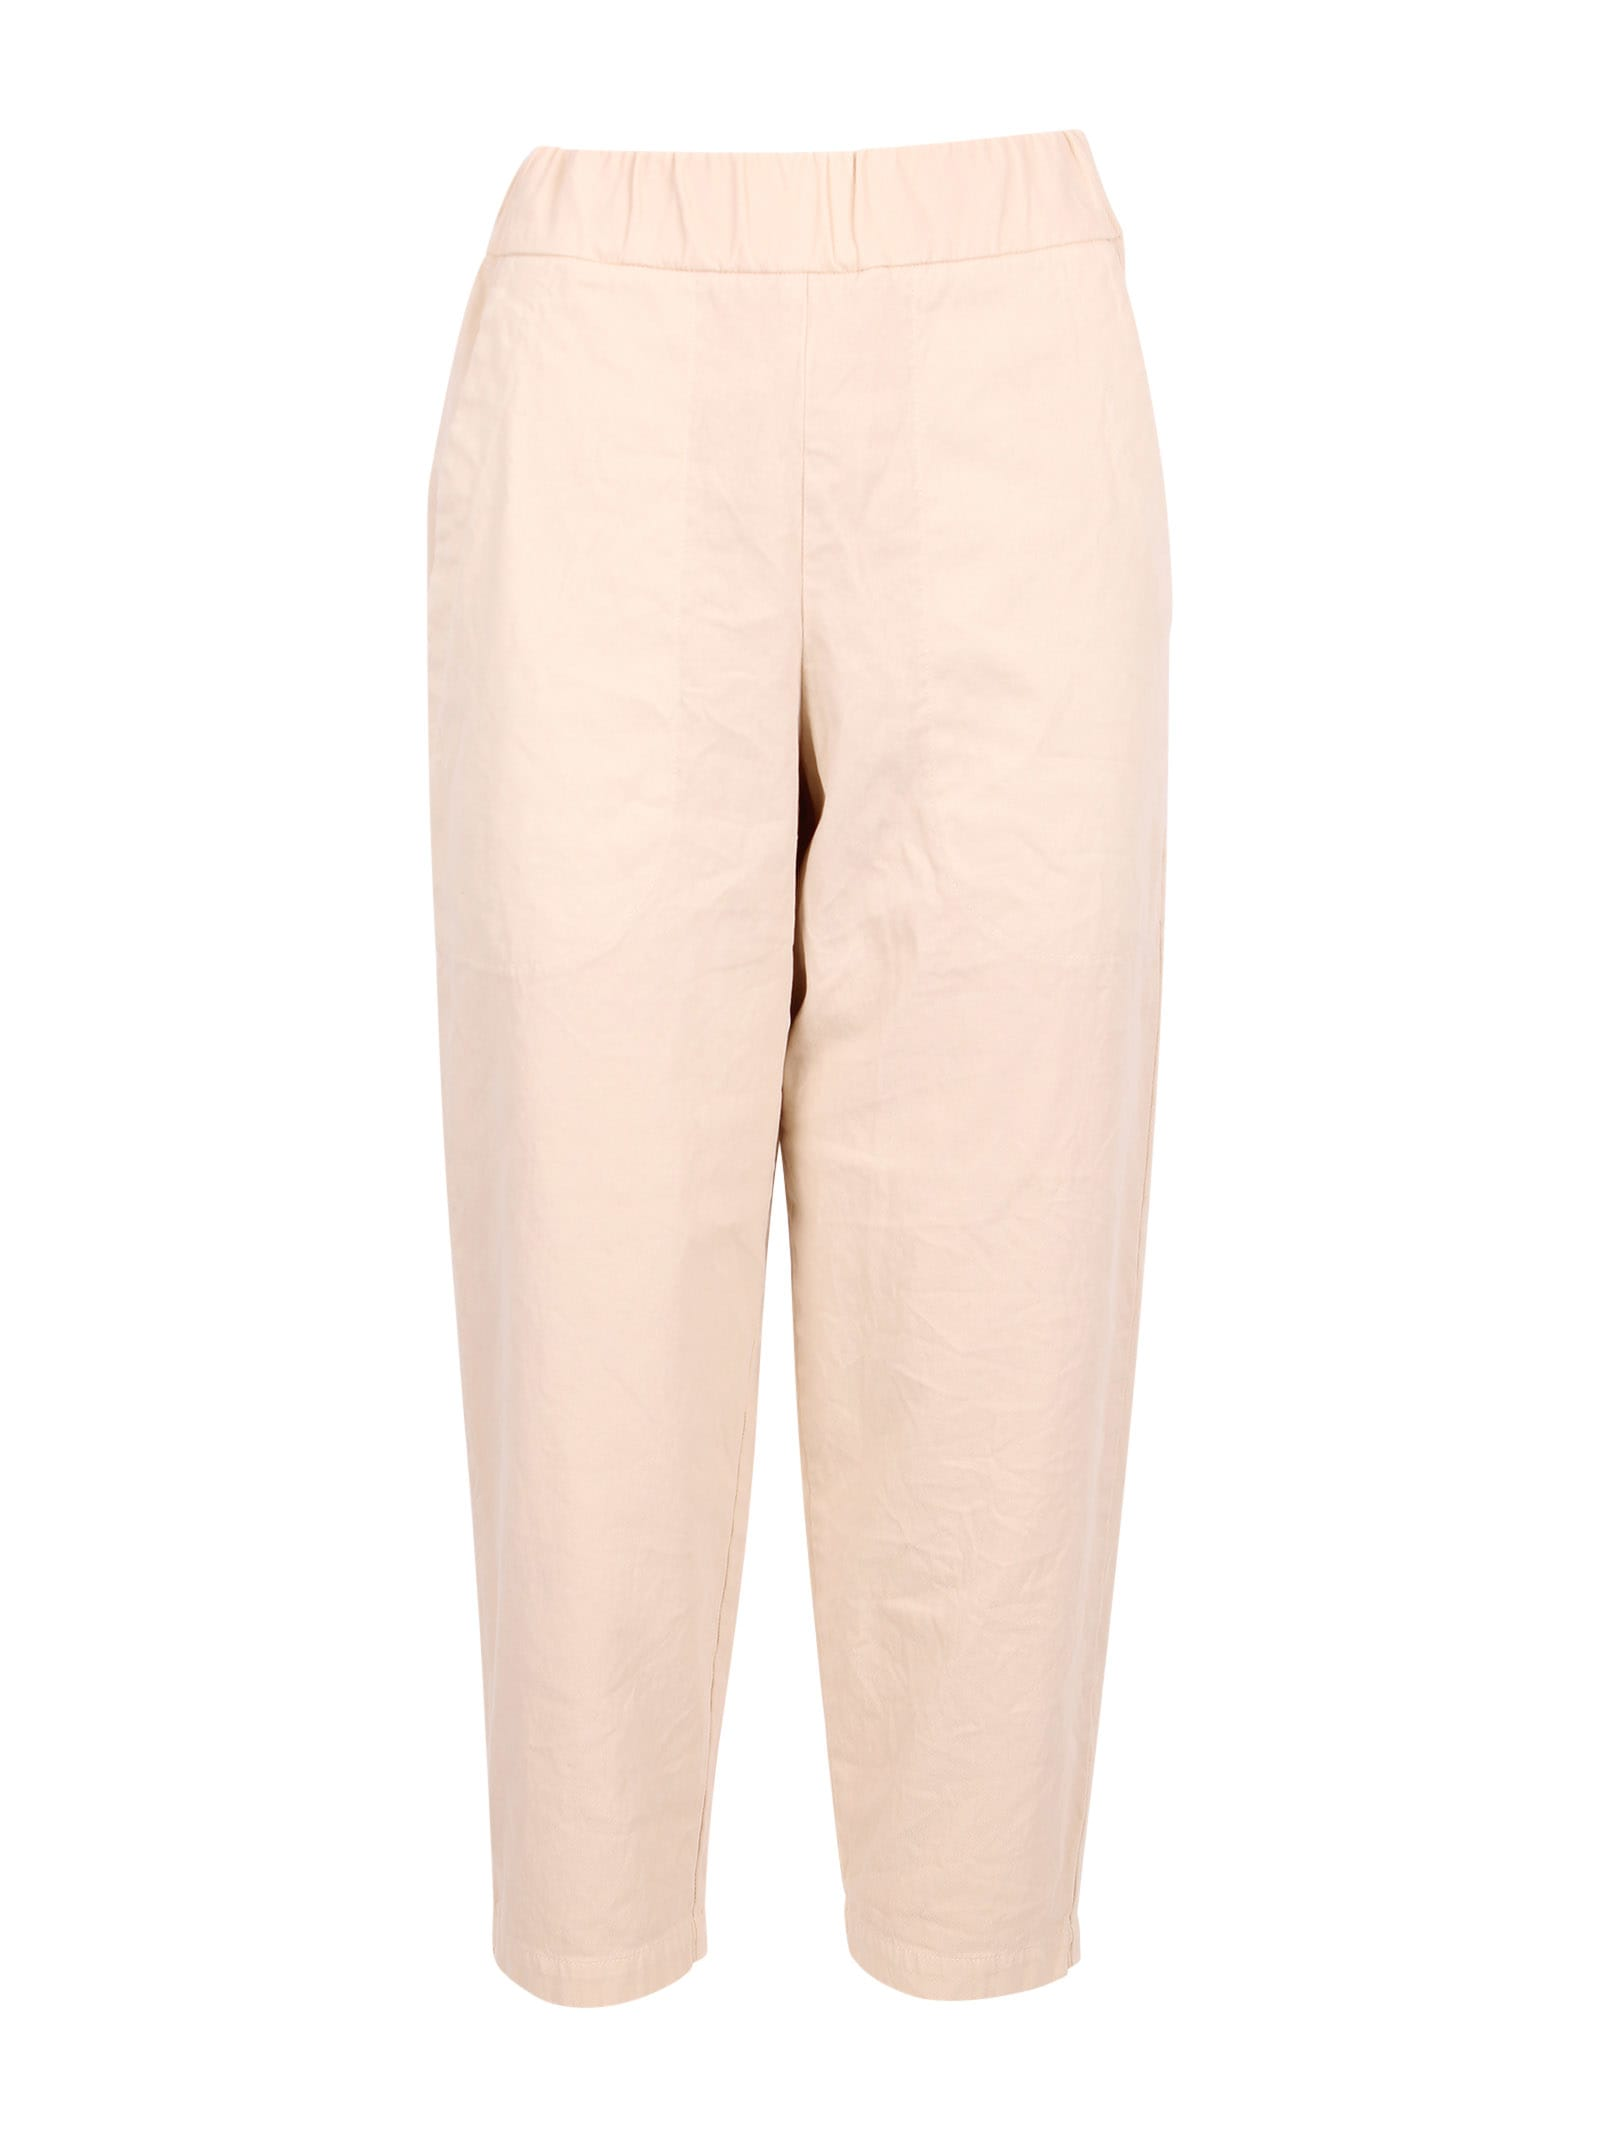 Barena Venezia Joie Mante Cotton Trousers In Ivory